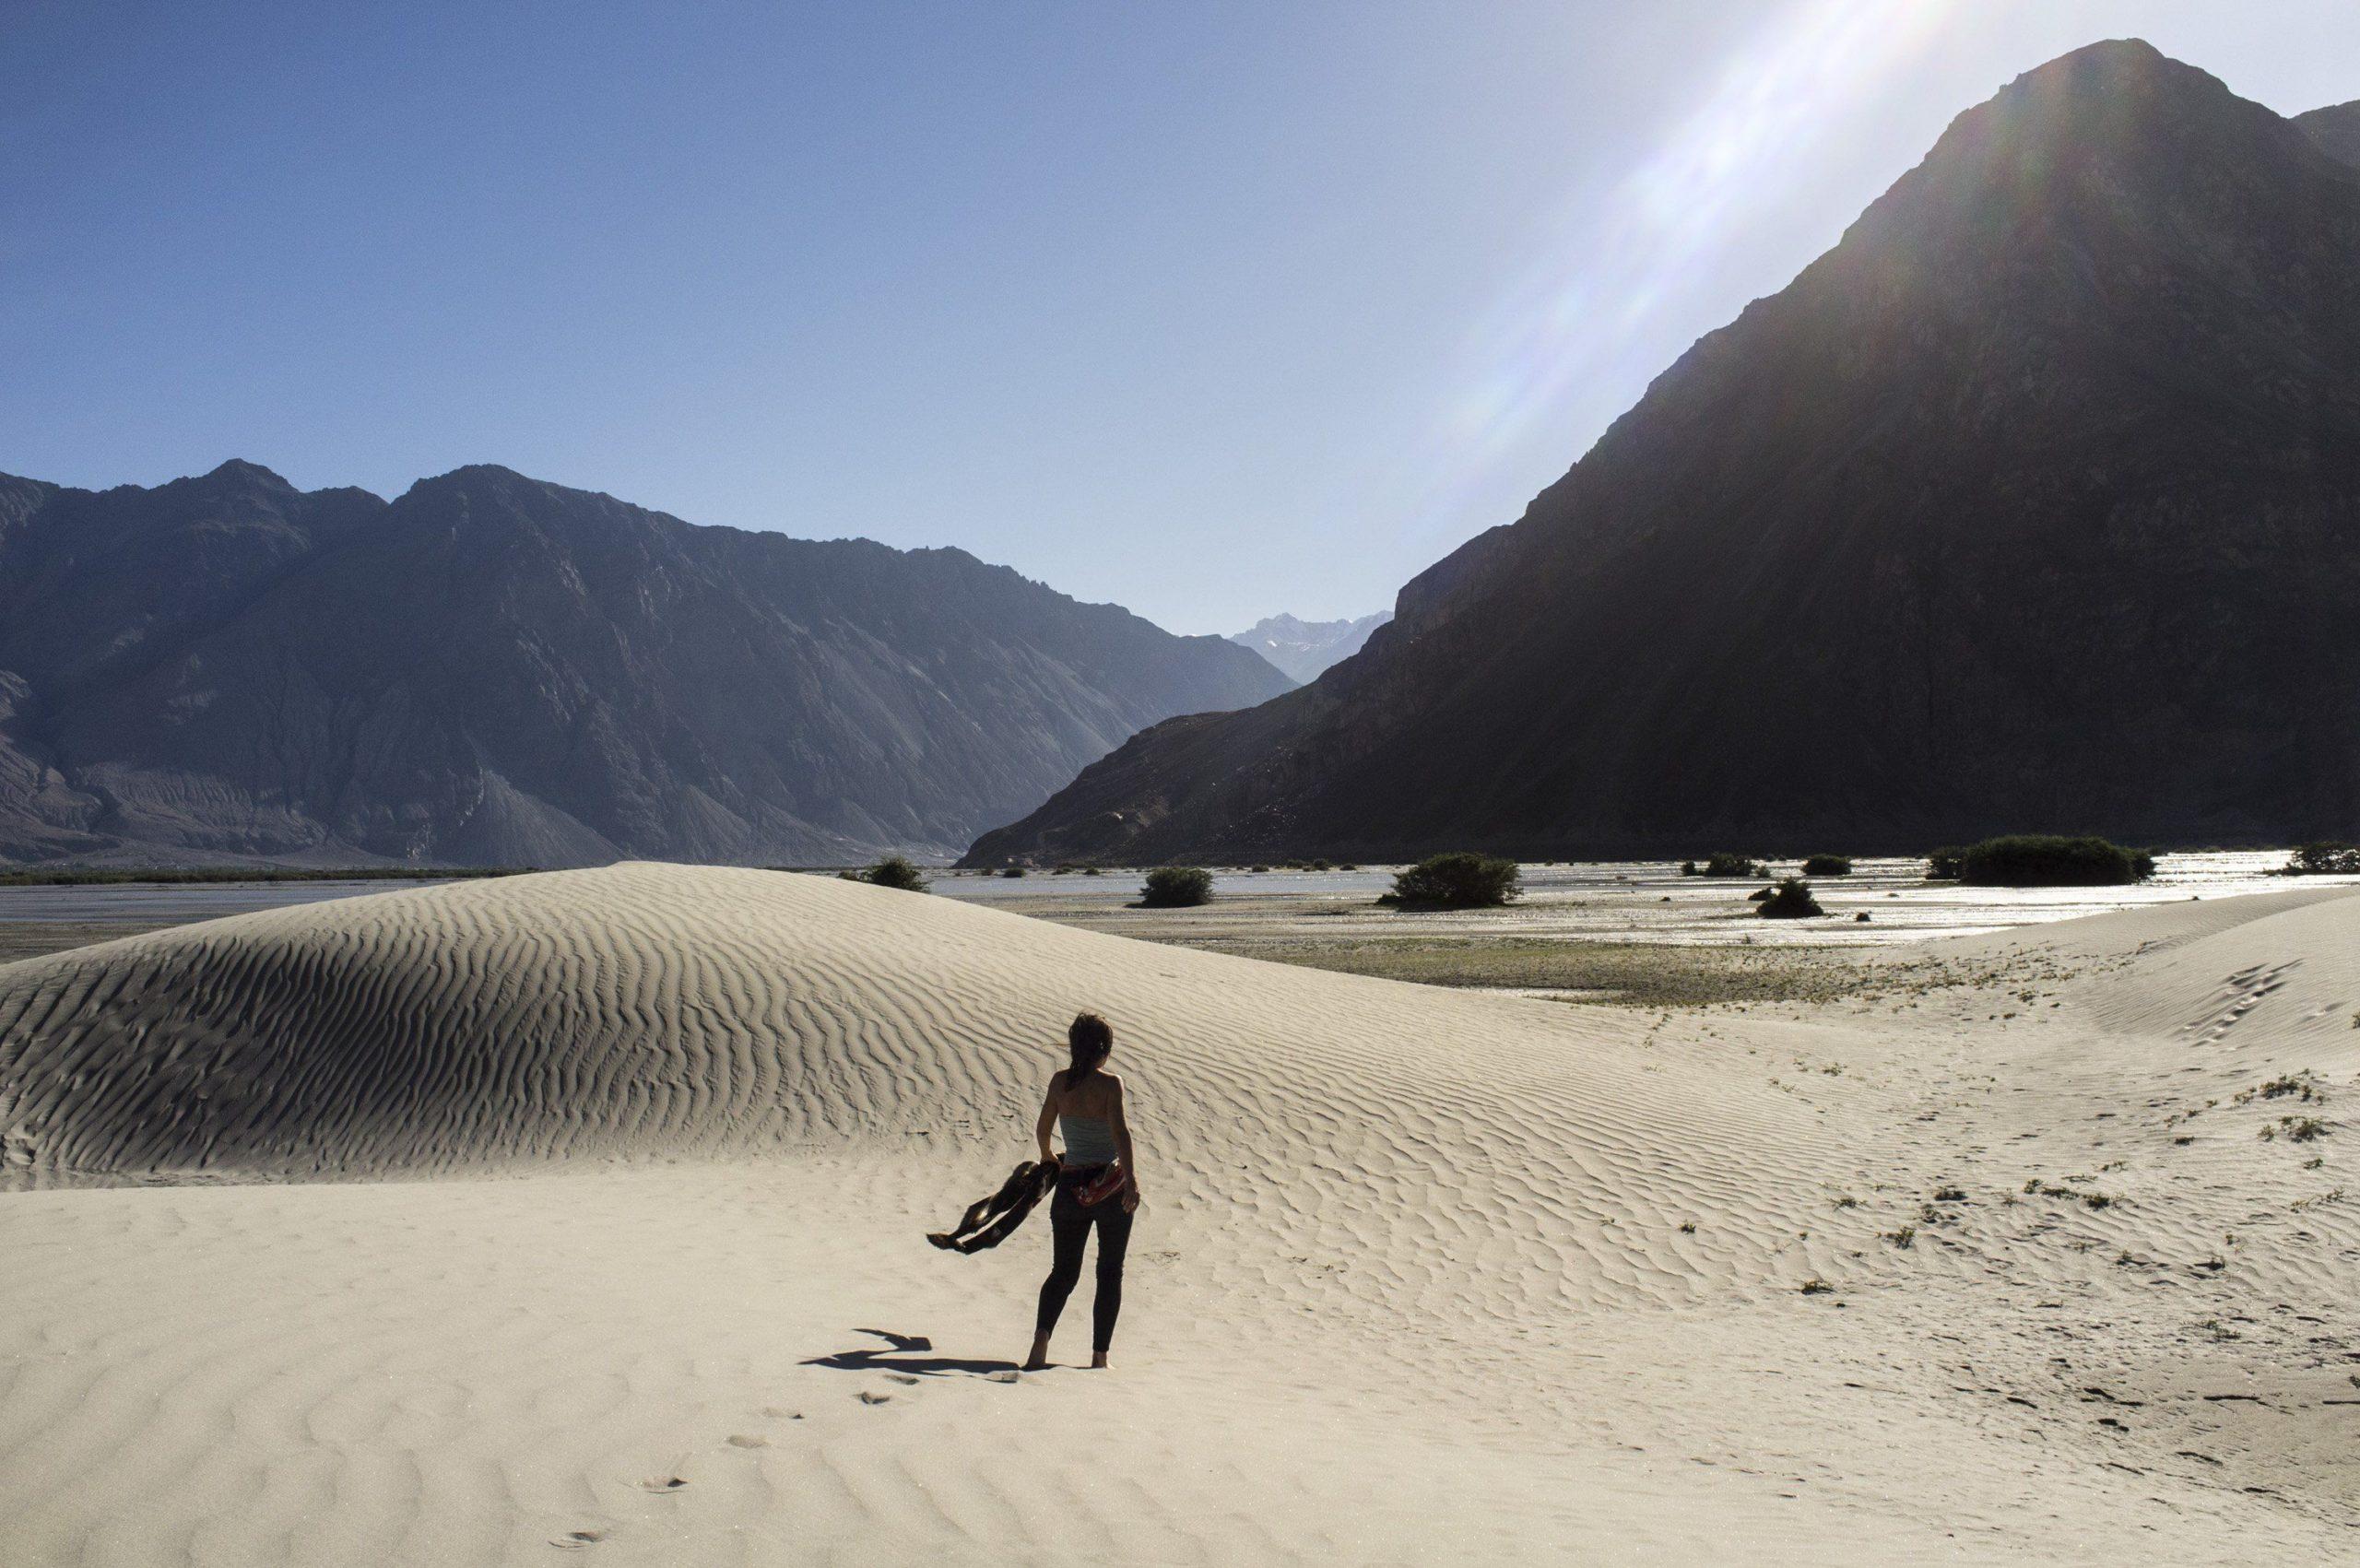 Motorcycle road trip India / Himalaya - Luxury Tour in Ladakh